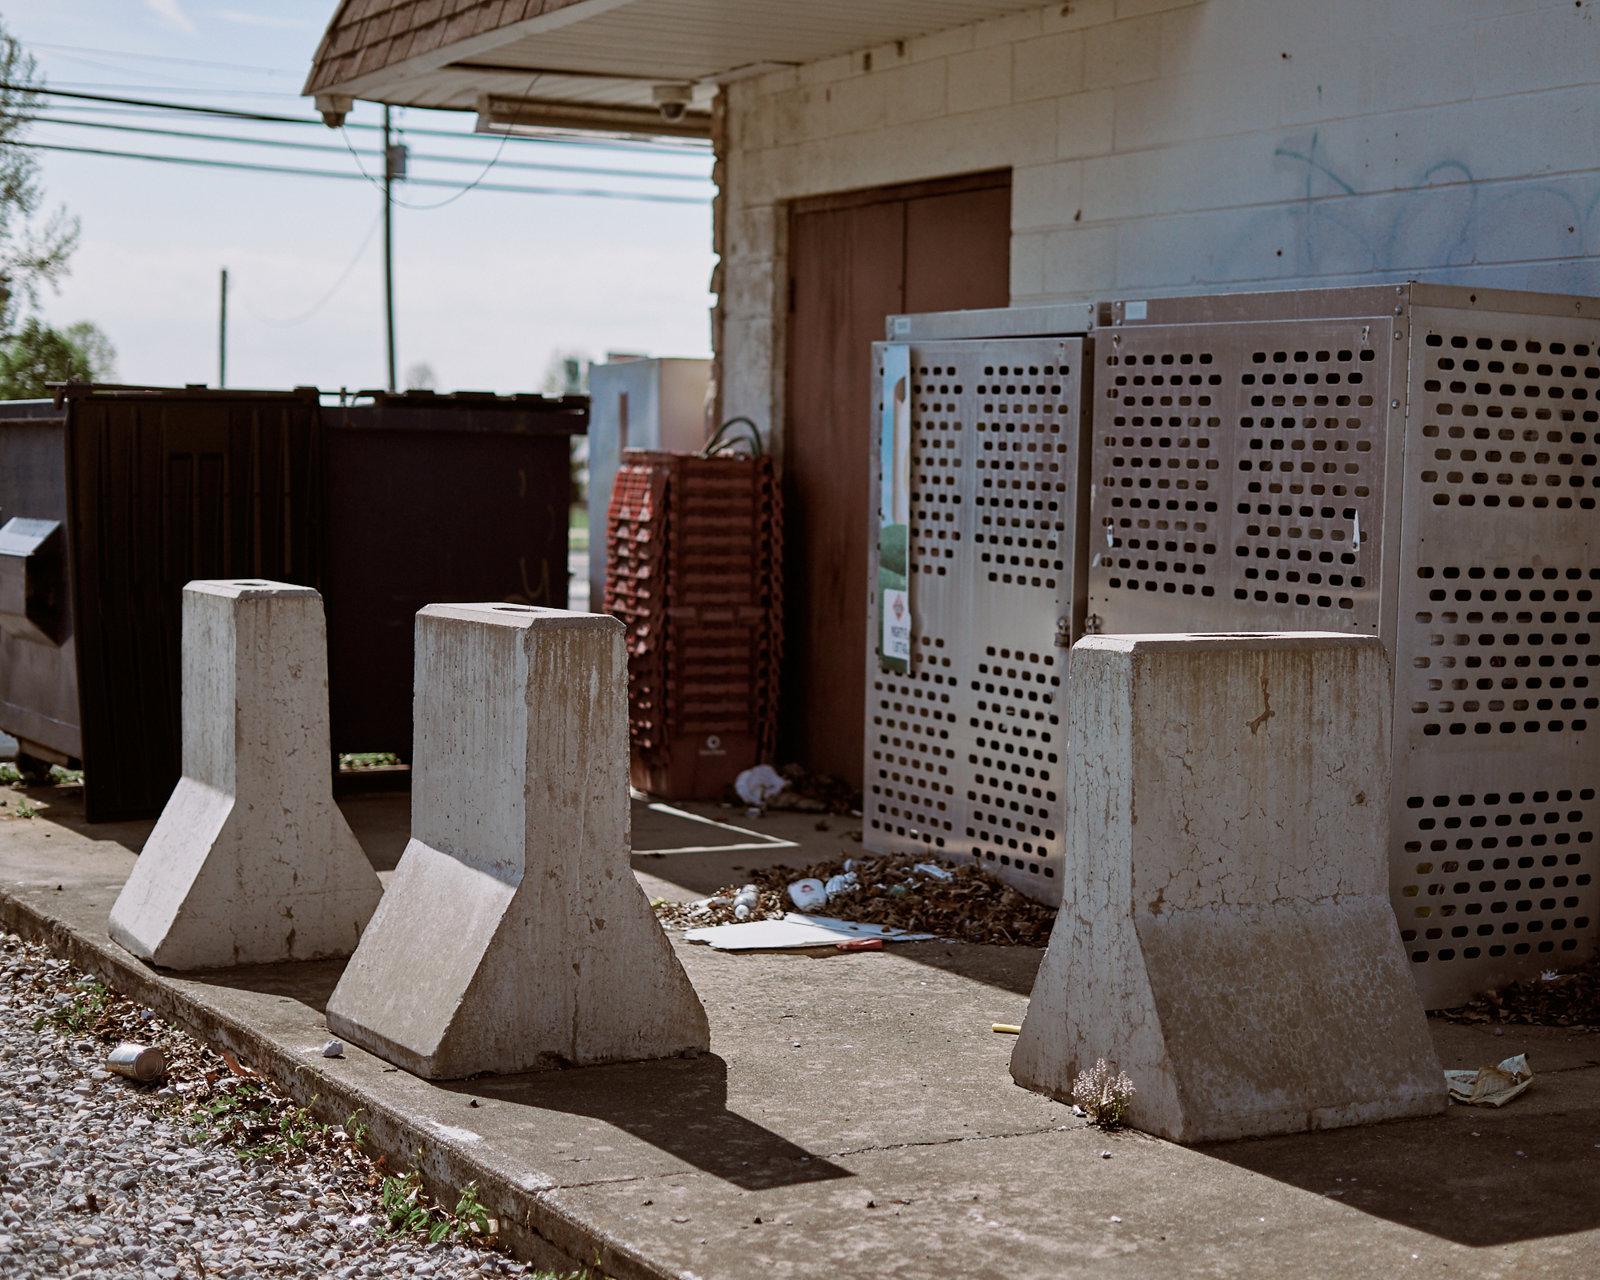 Street Photography, Mechanicsburg, Pennsylvania, A Series of Things